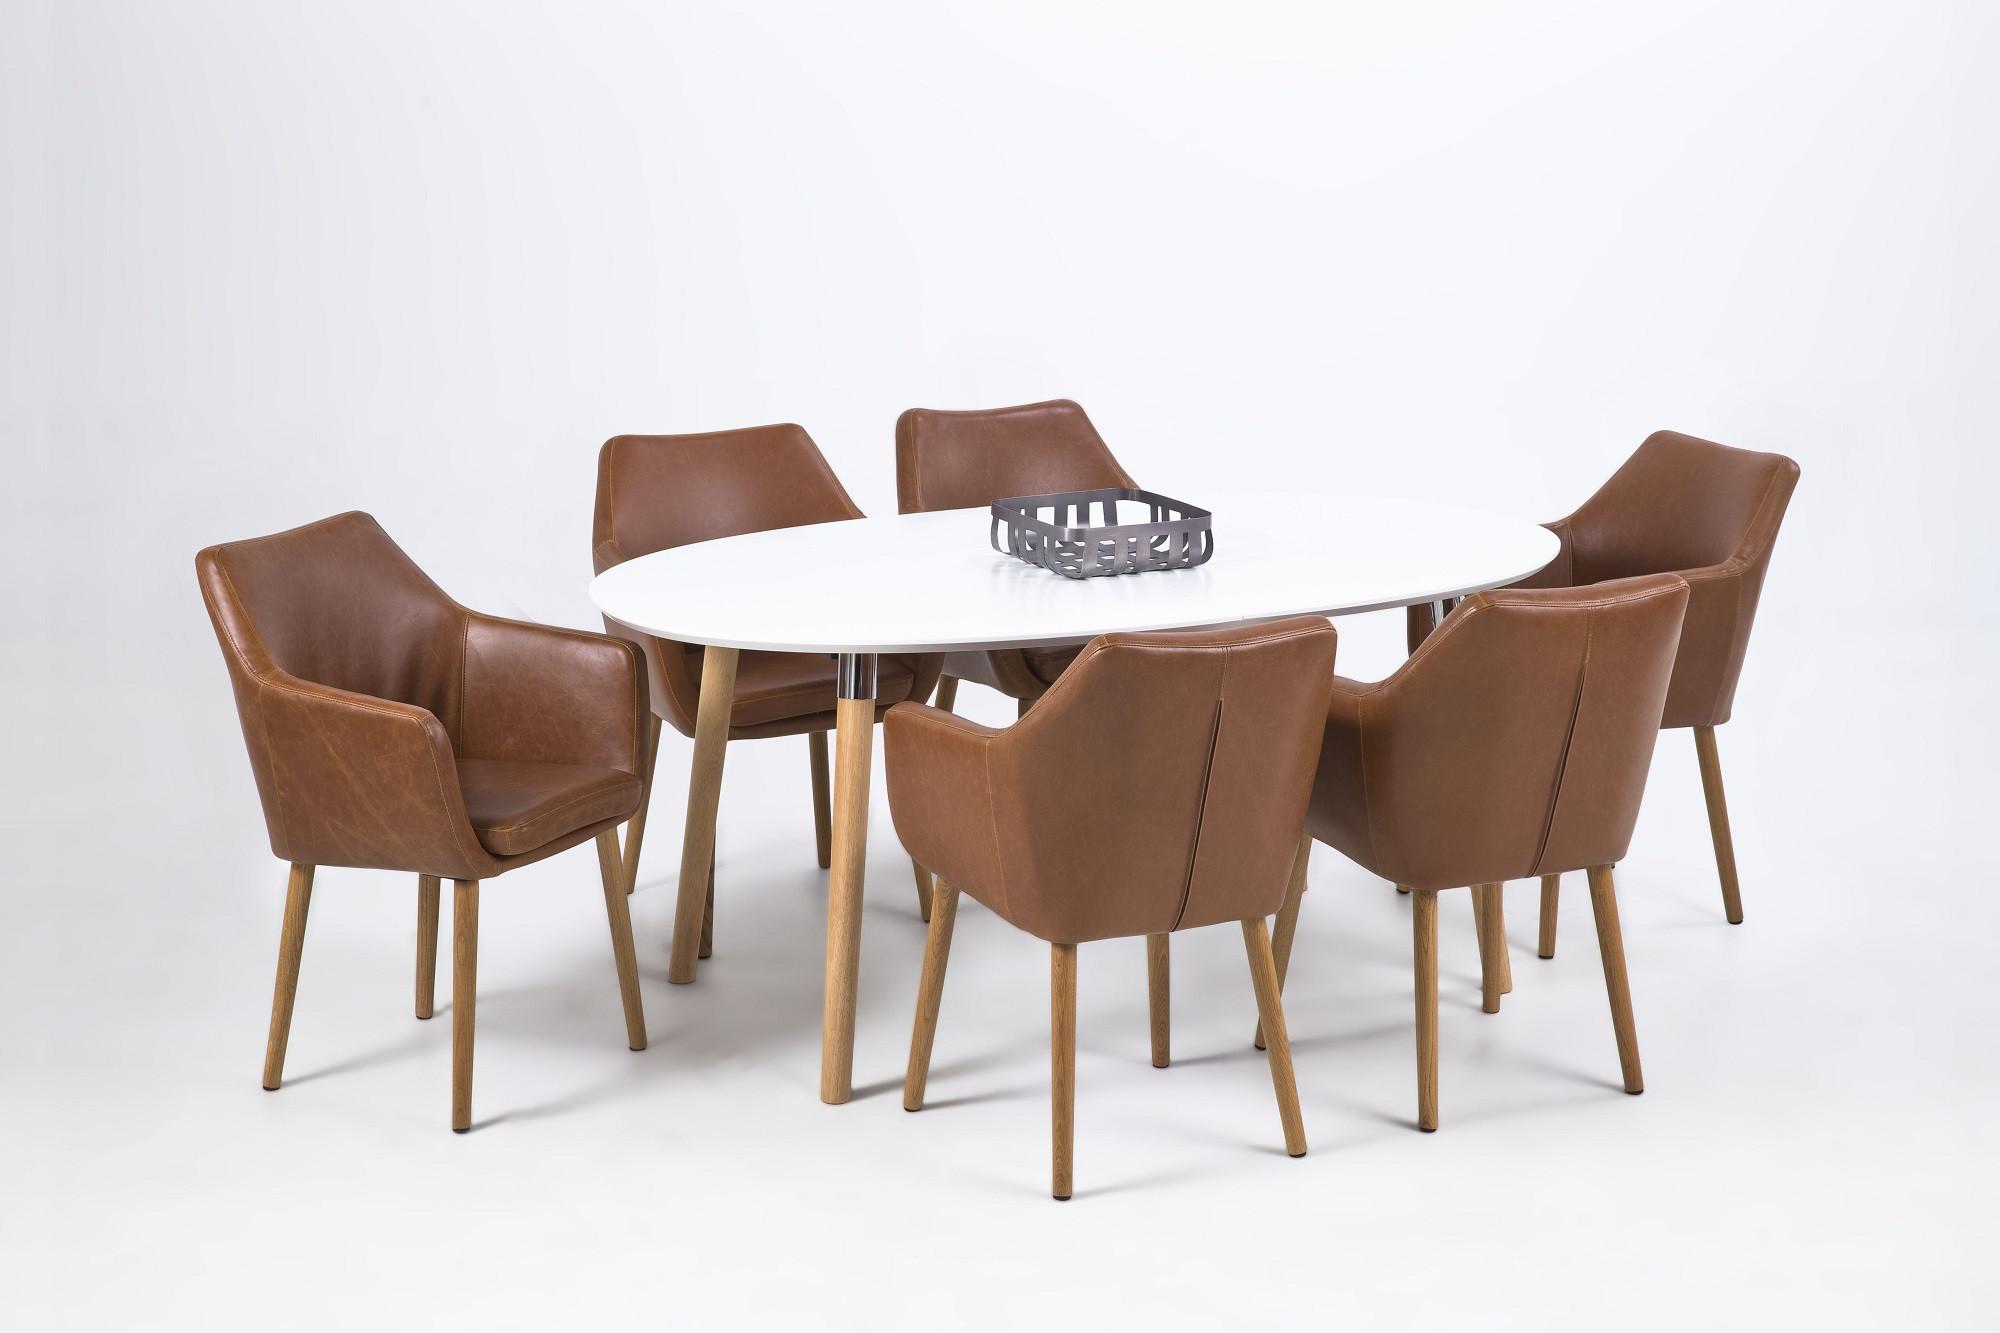 Table extensible de style scandinave blanc et bois hellin for Table salle a manger extensible